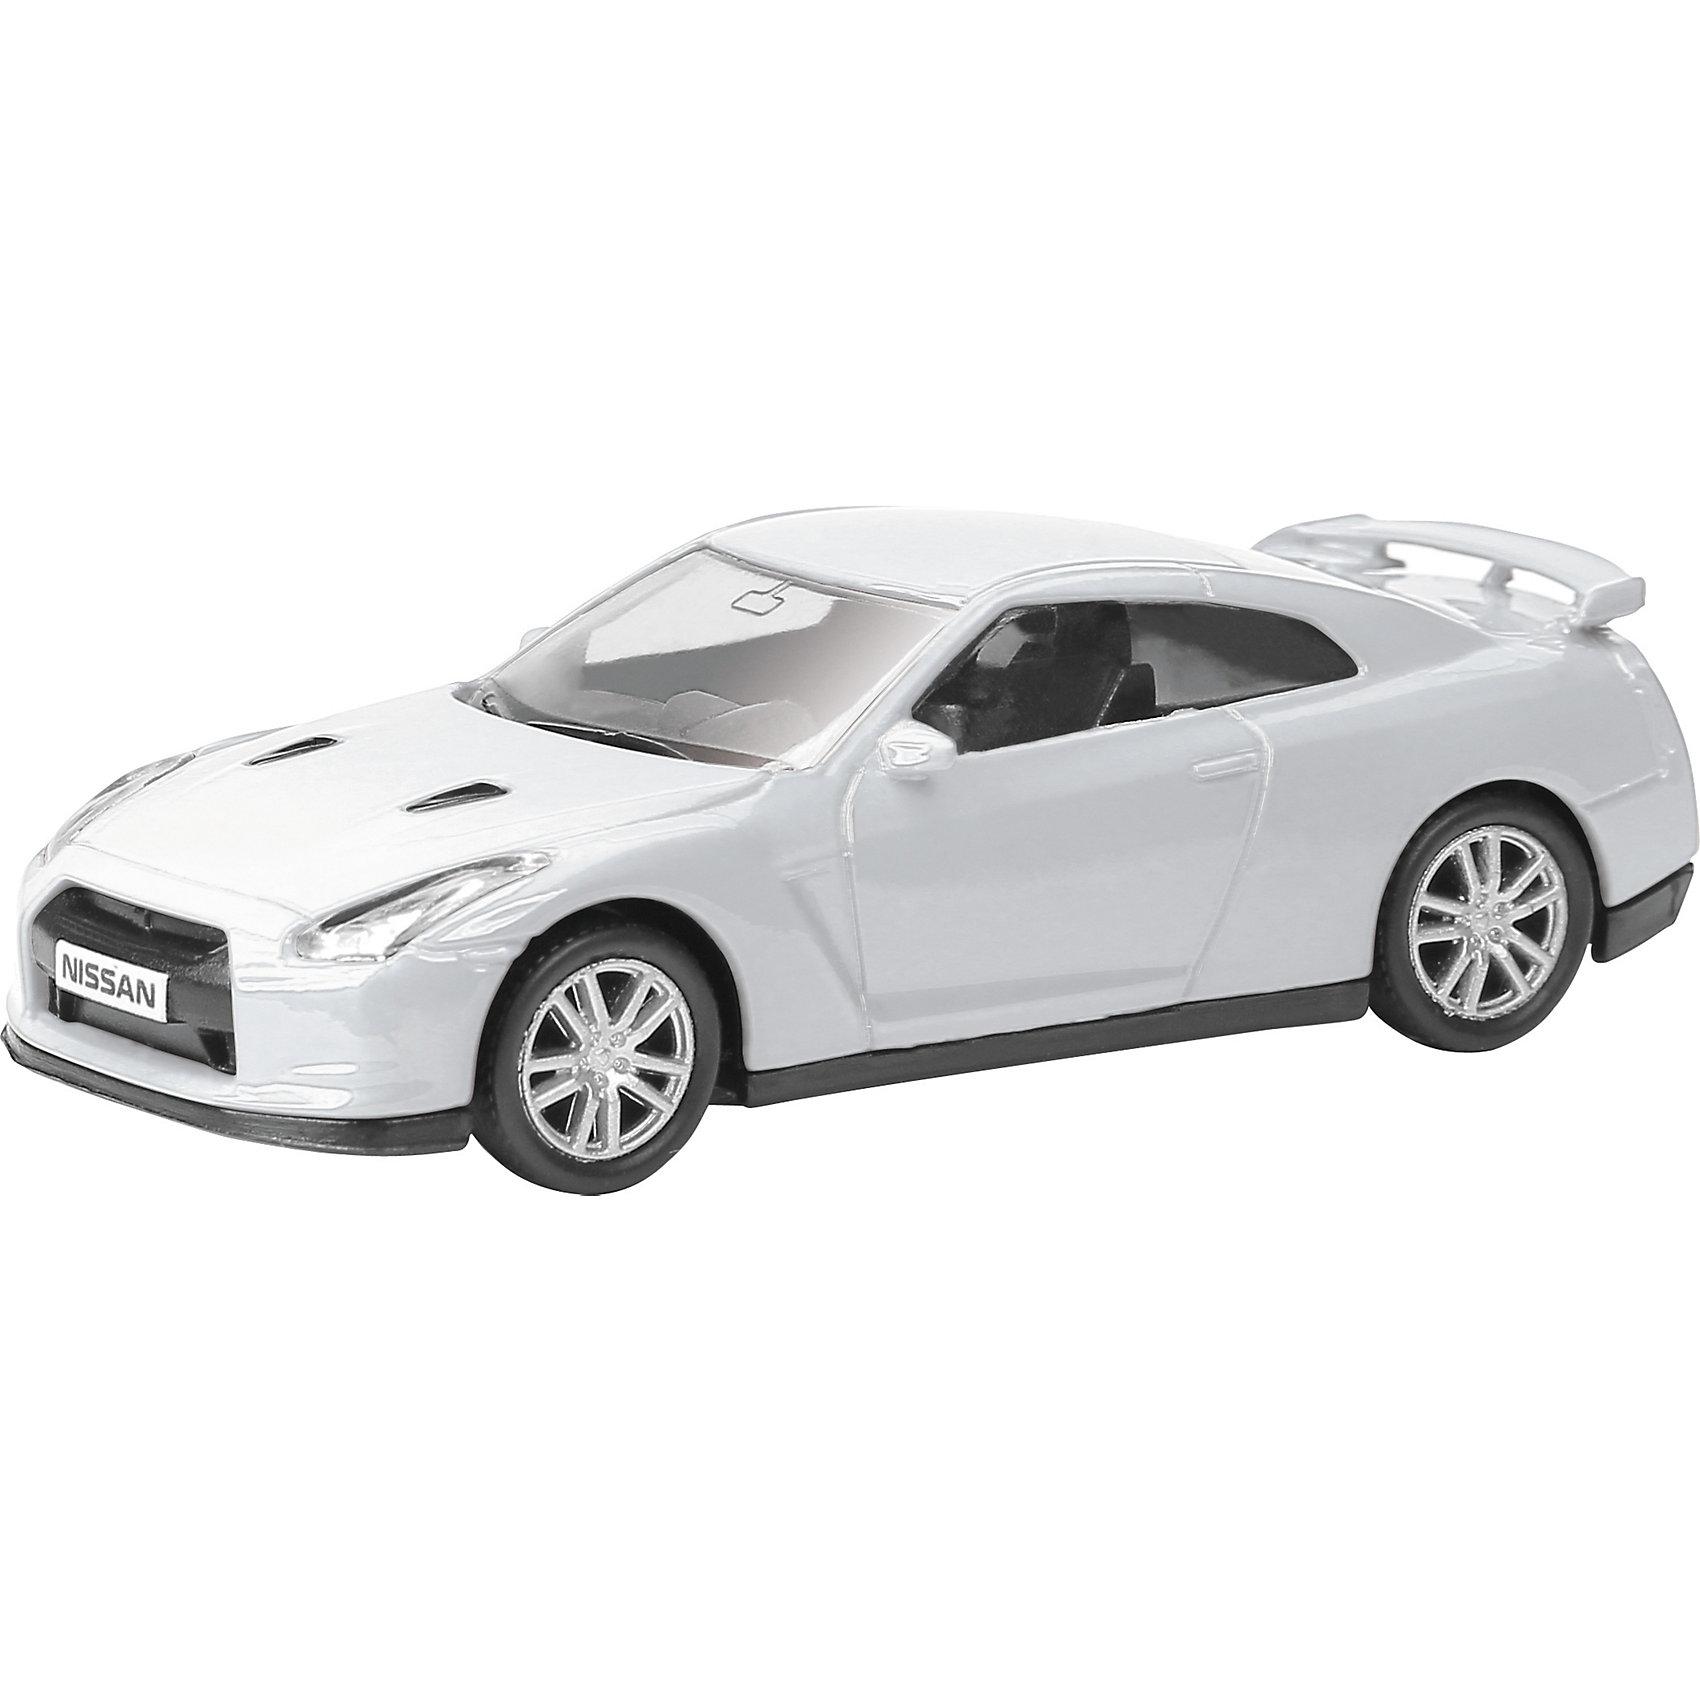 Машинка Nissan GT-R (R35) 1:64, AutotimeМашинки<br><br><br>Ширина мм: 90<br>Глубина мм: 42<br>Высота мм: 40<br>Вес г: 13<br>Возраст от месяцев: 36<br>Возраст до месяцев: 2147483647<br>Пол: Мужской<br>Возраст: Детский<br>SKU: 5584085